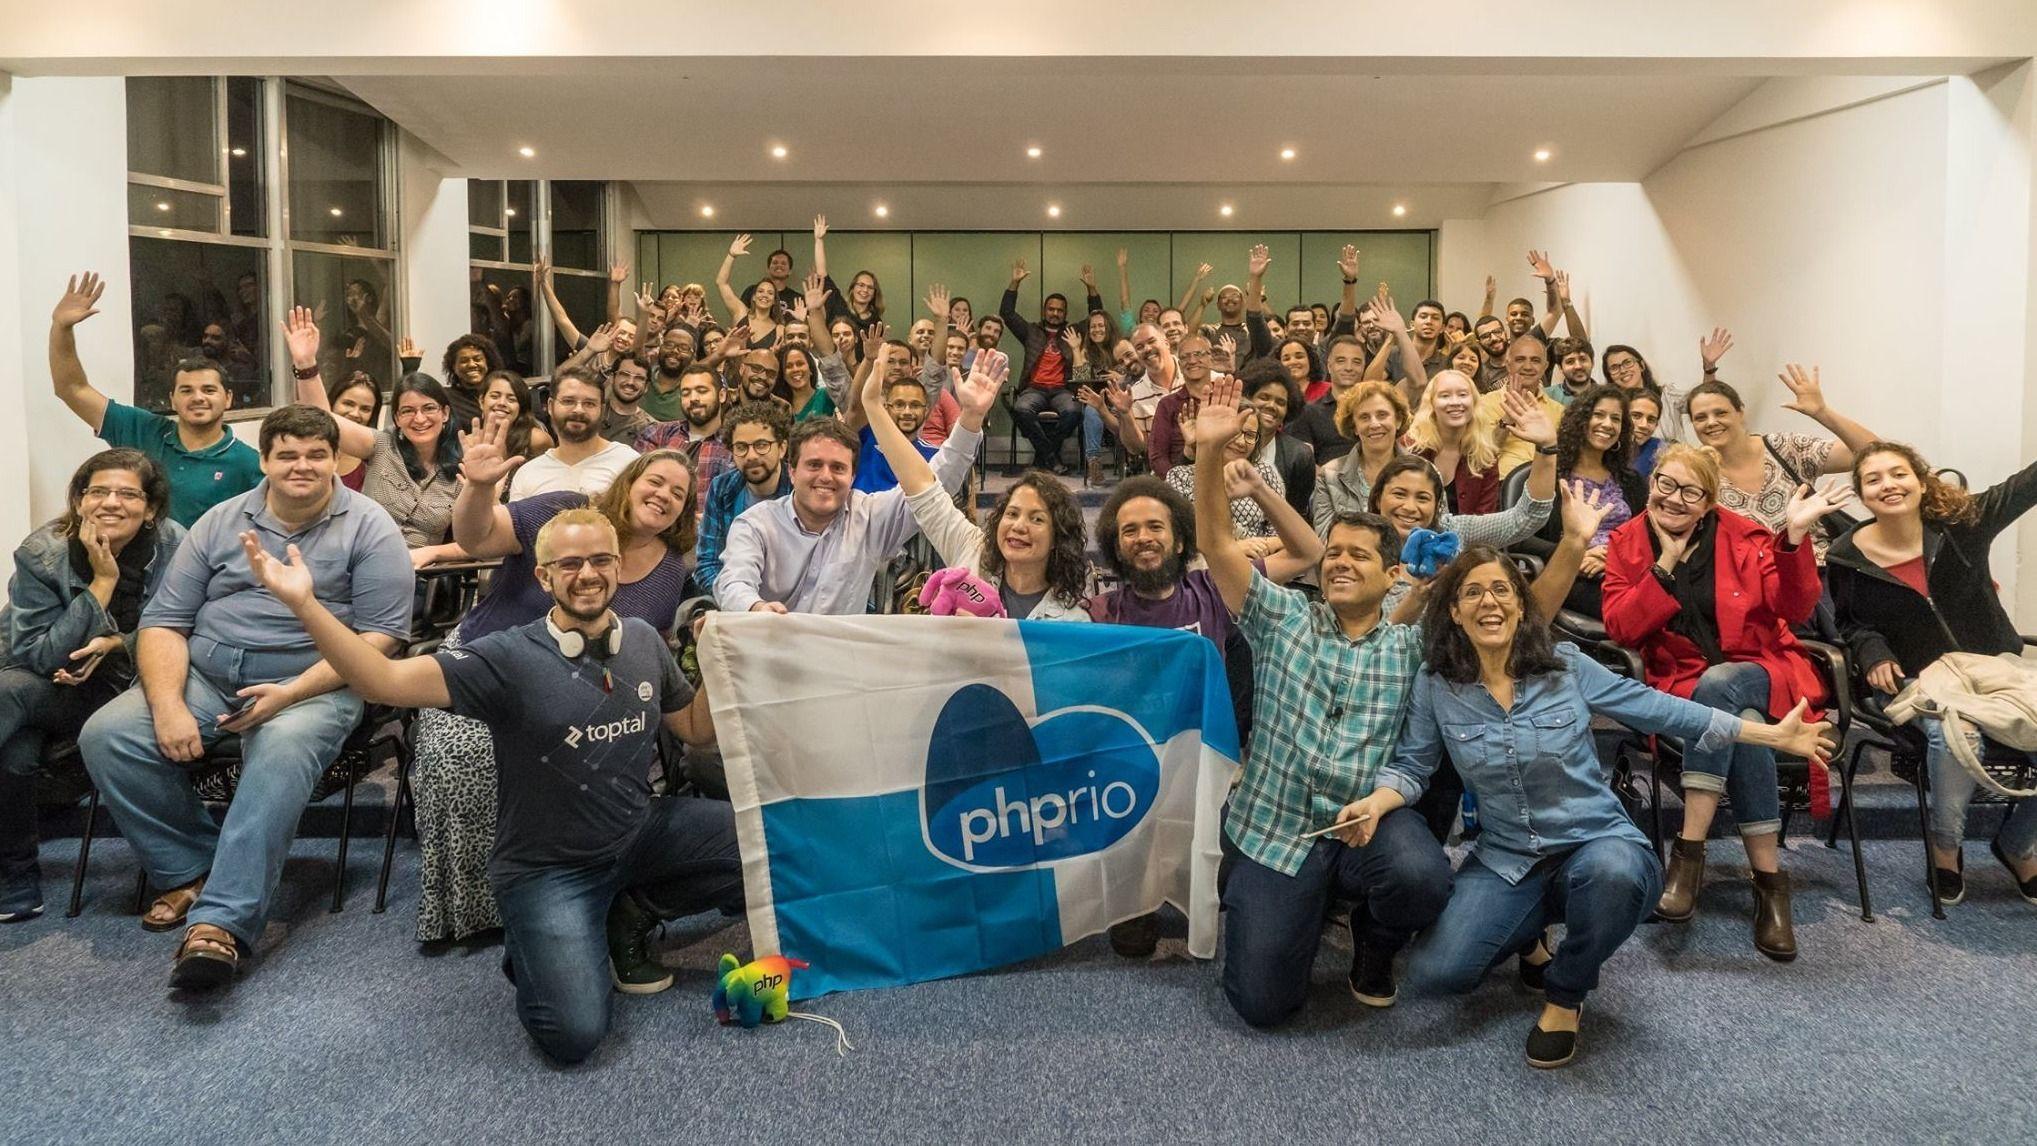 PHP Rio